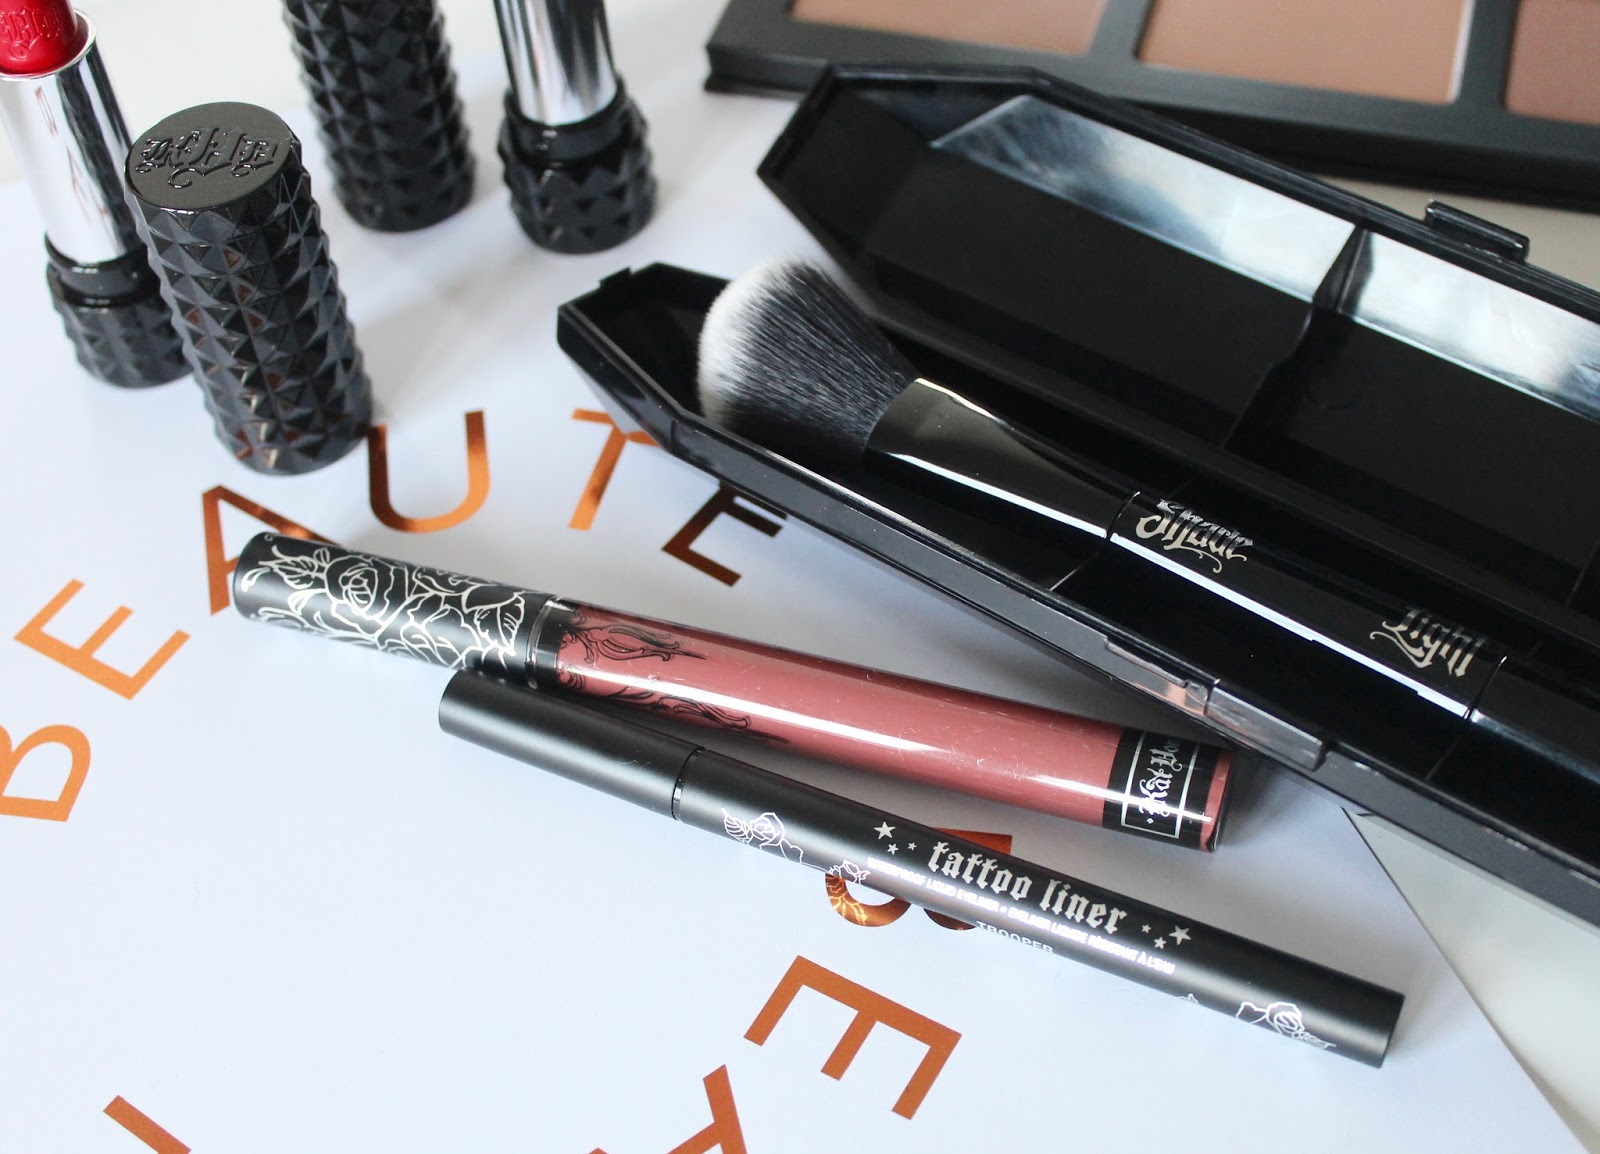 Kat Von D Iconic Beauty Products